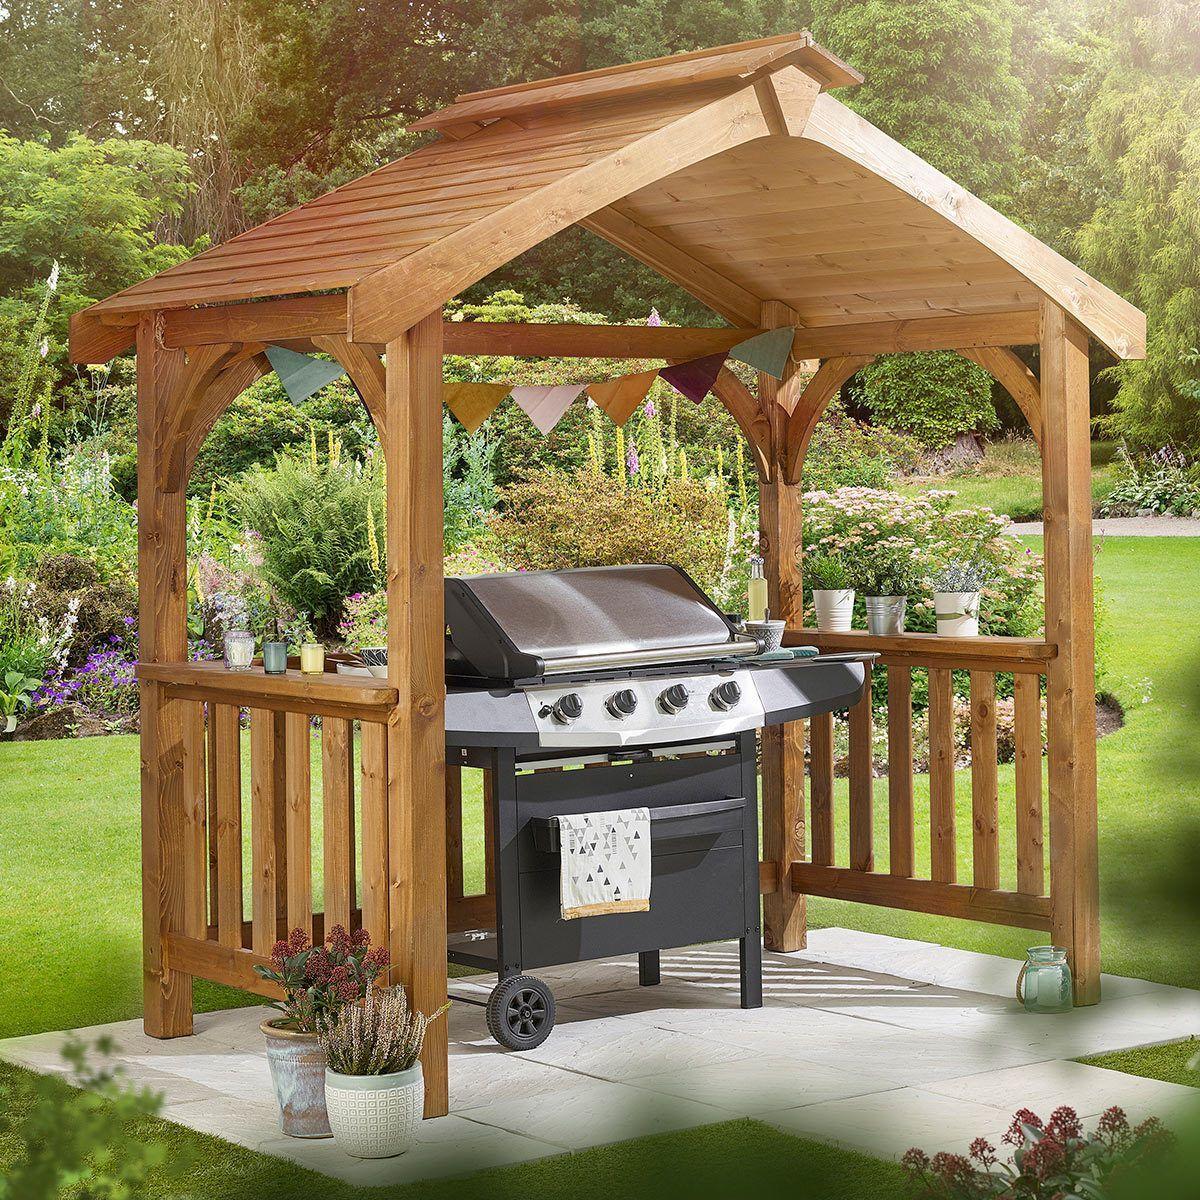 Anchor Fast Pine Wood Bbq Grilling Pavilion Costco Uk Pergola